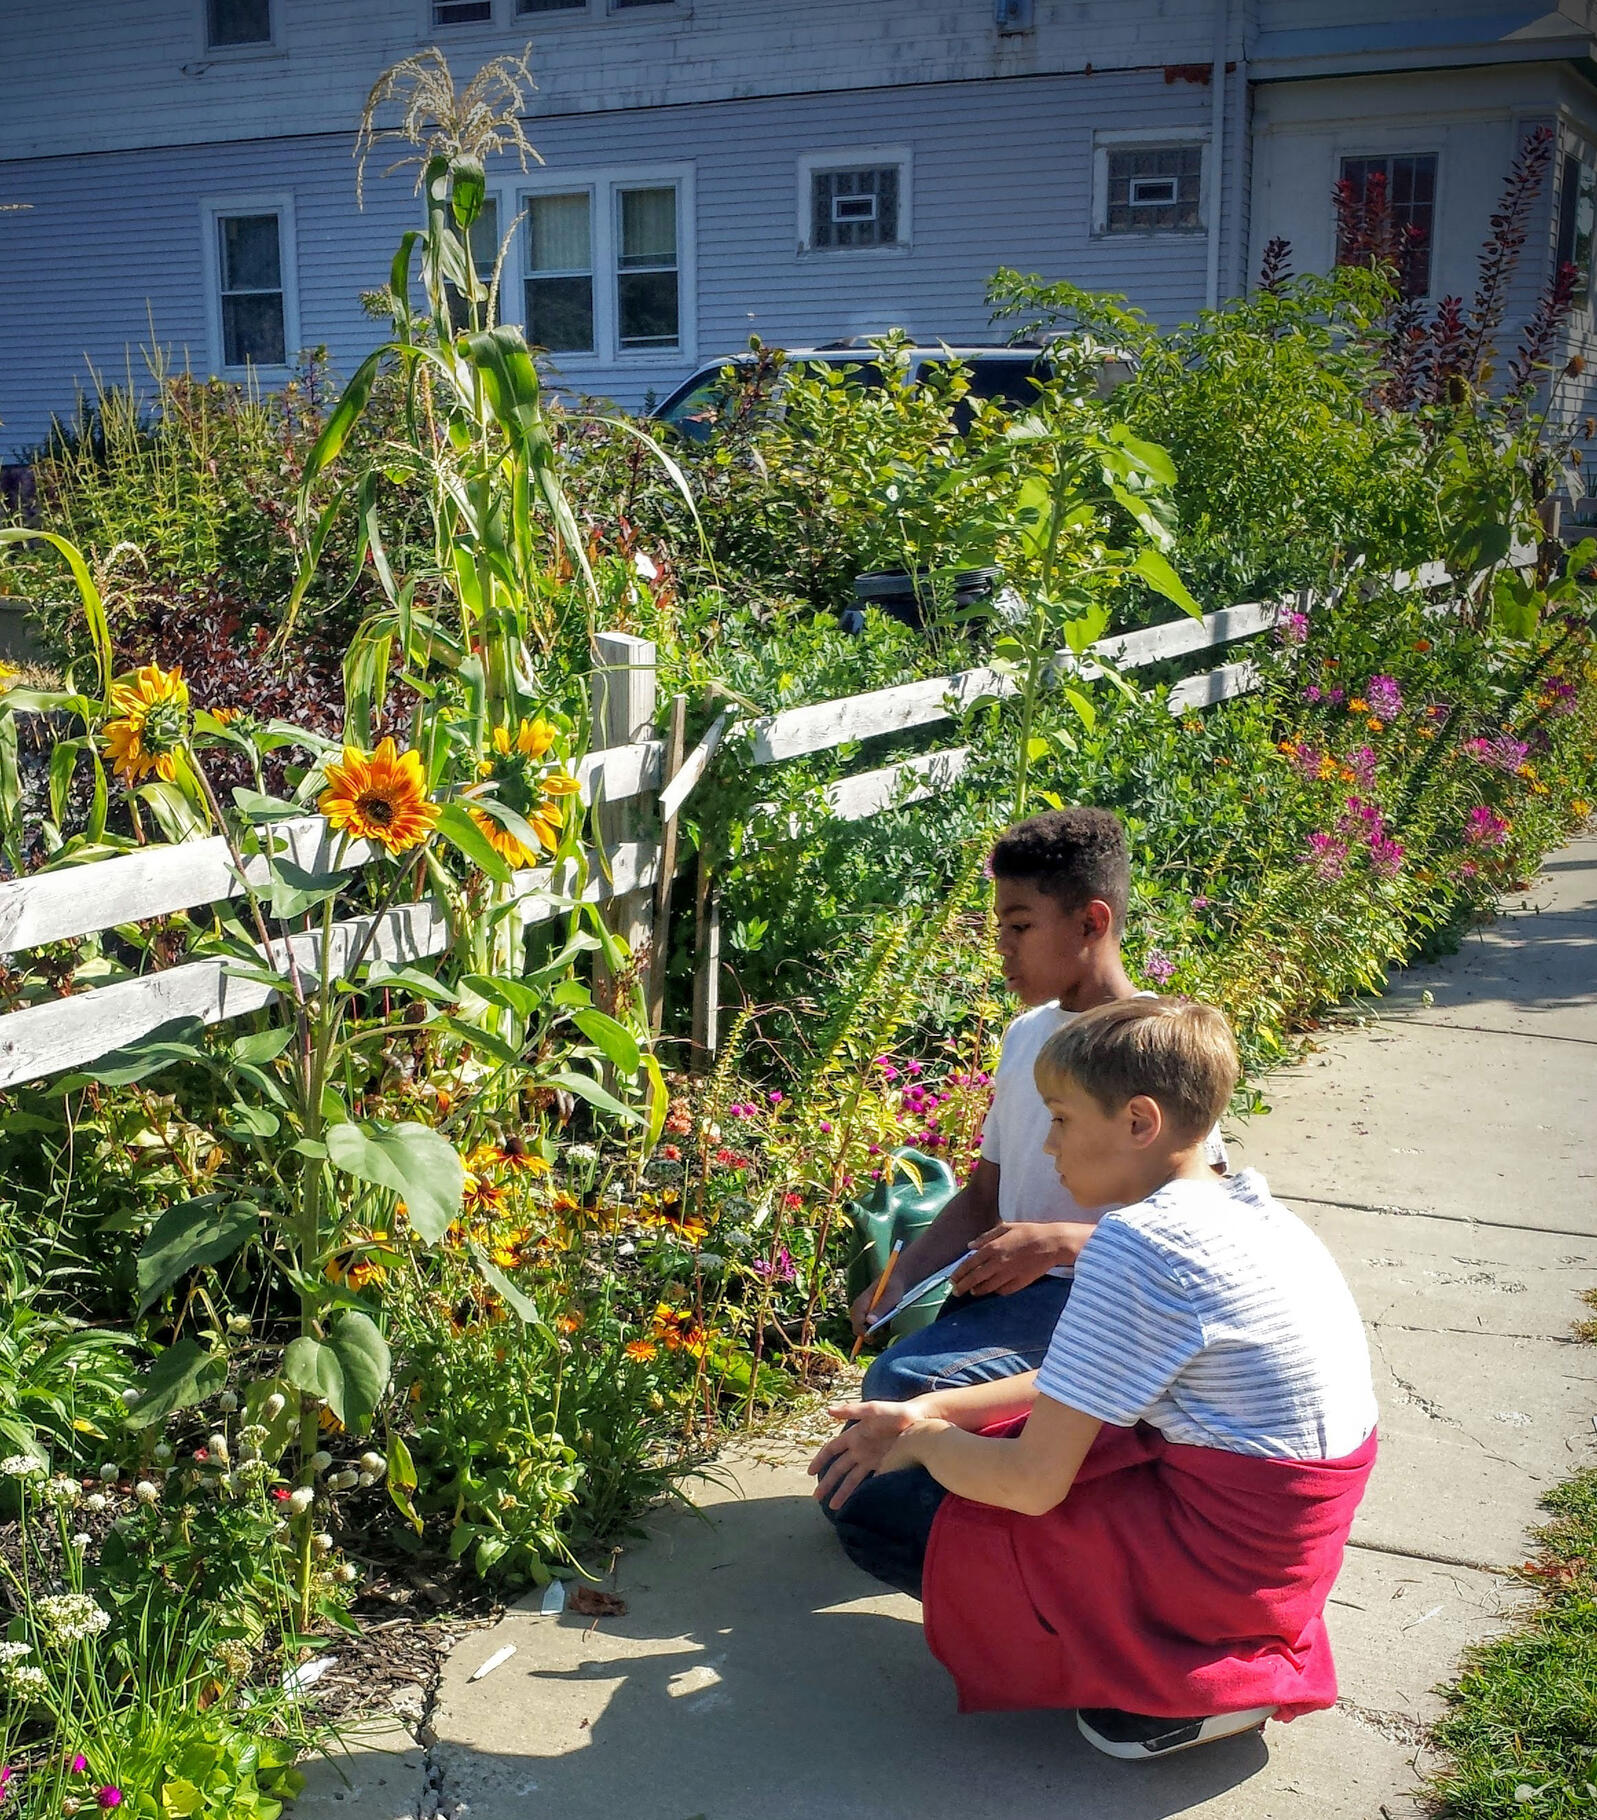 Buffalo nonprofits are transforming empty spaces into thriving gardens. Lauren Makeyenko/Buffalo Audubon Society